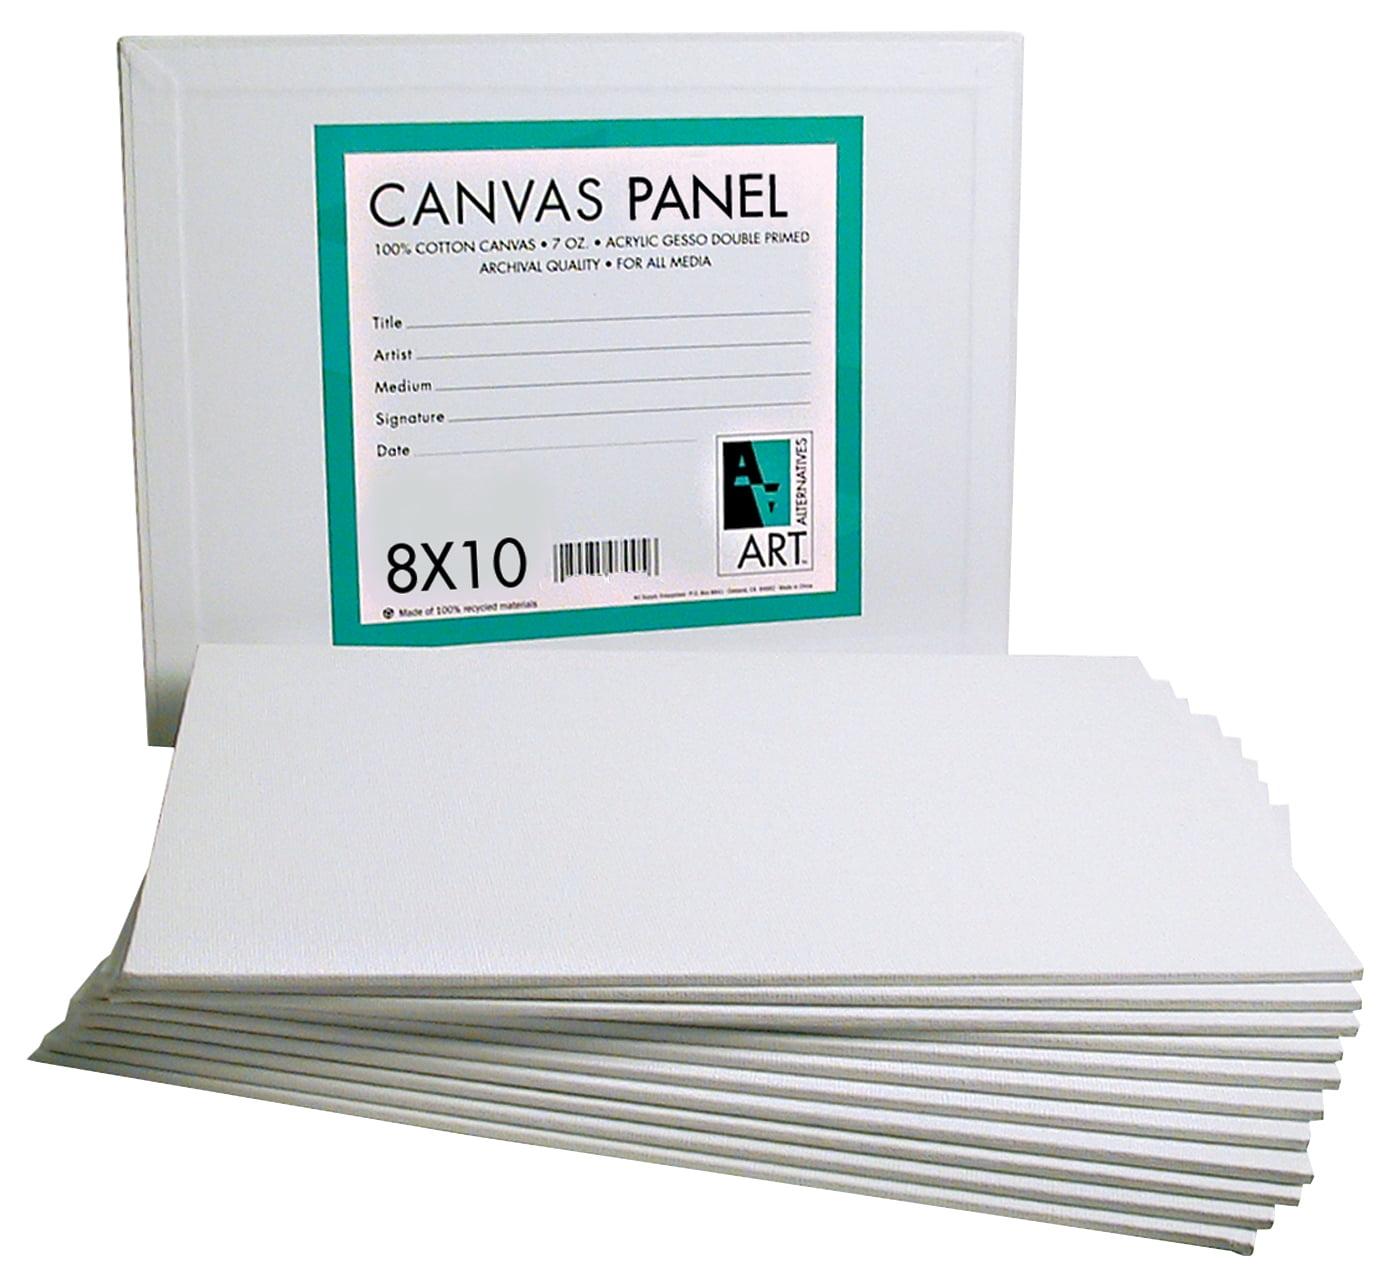 CANVAS PANEL 8x10